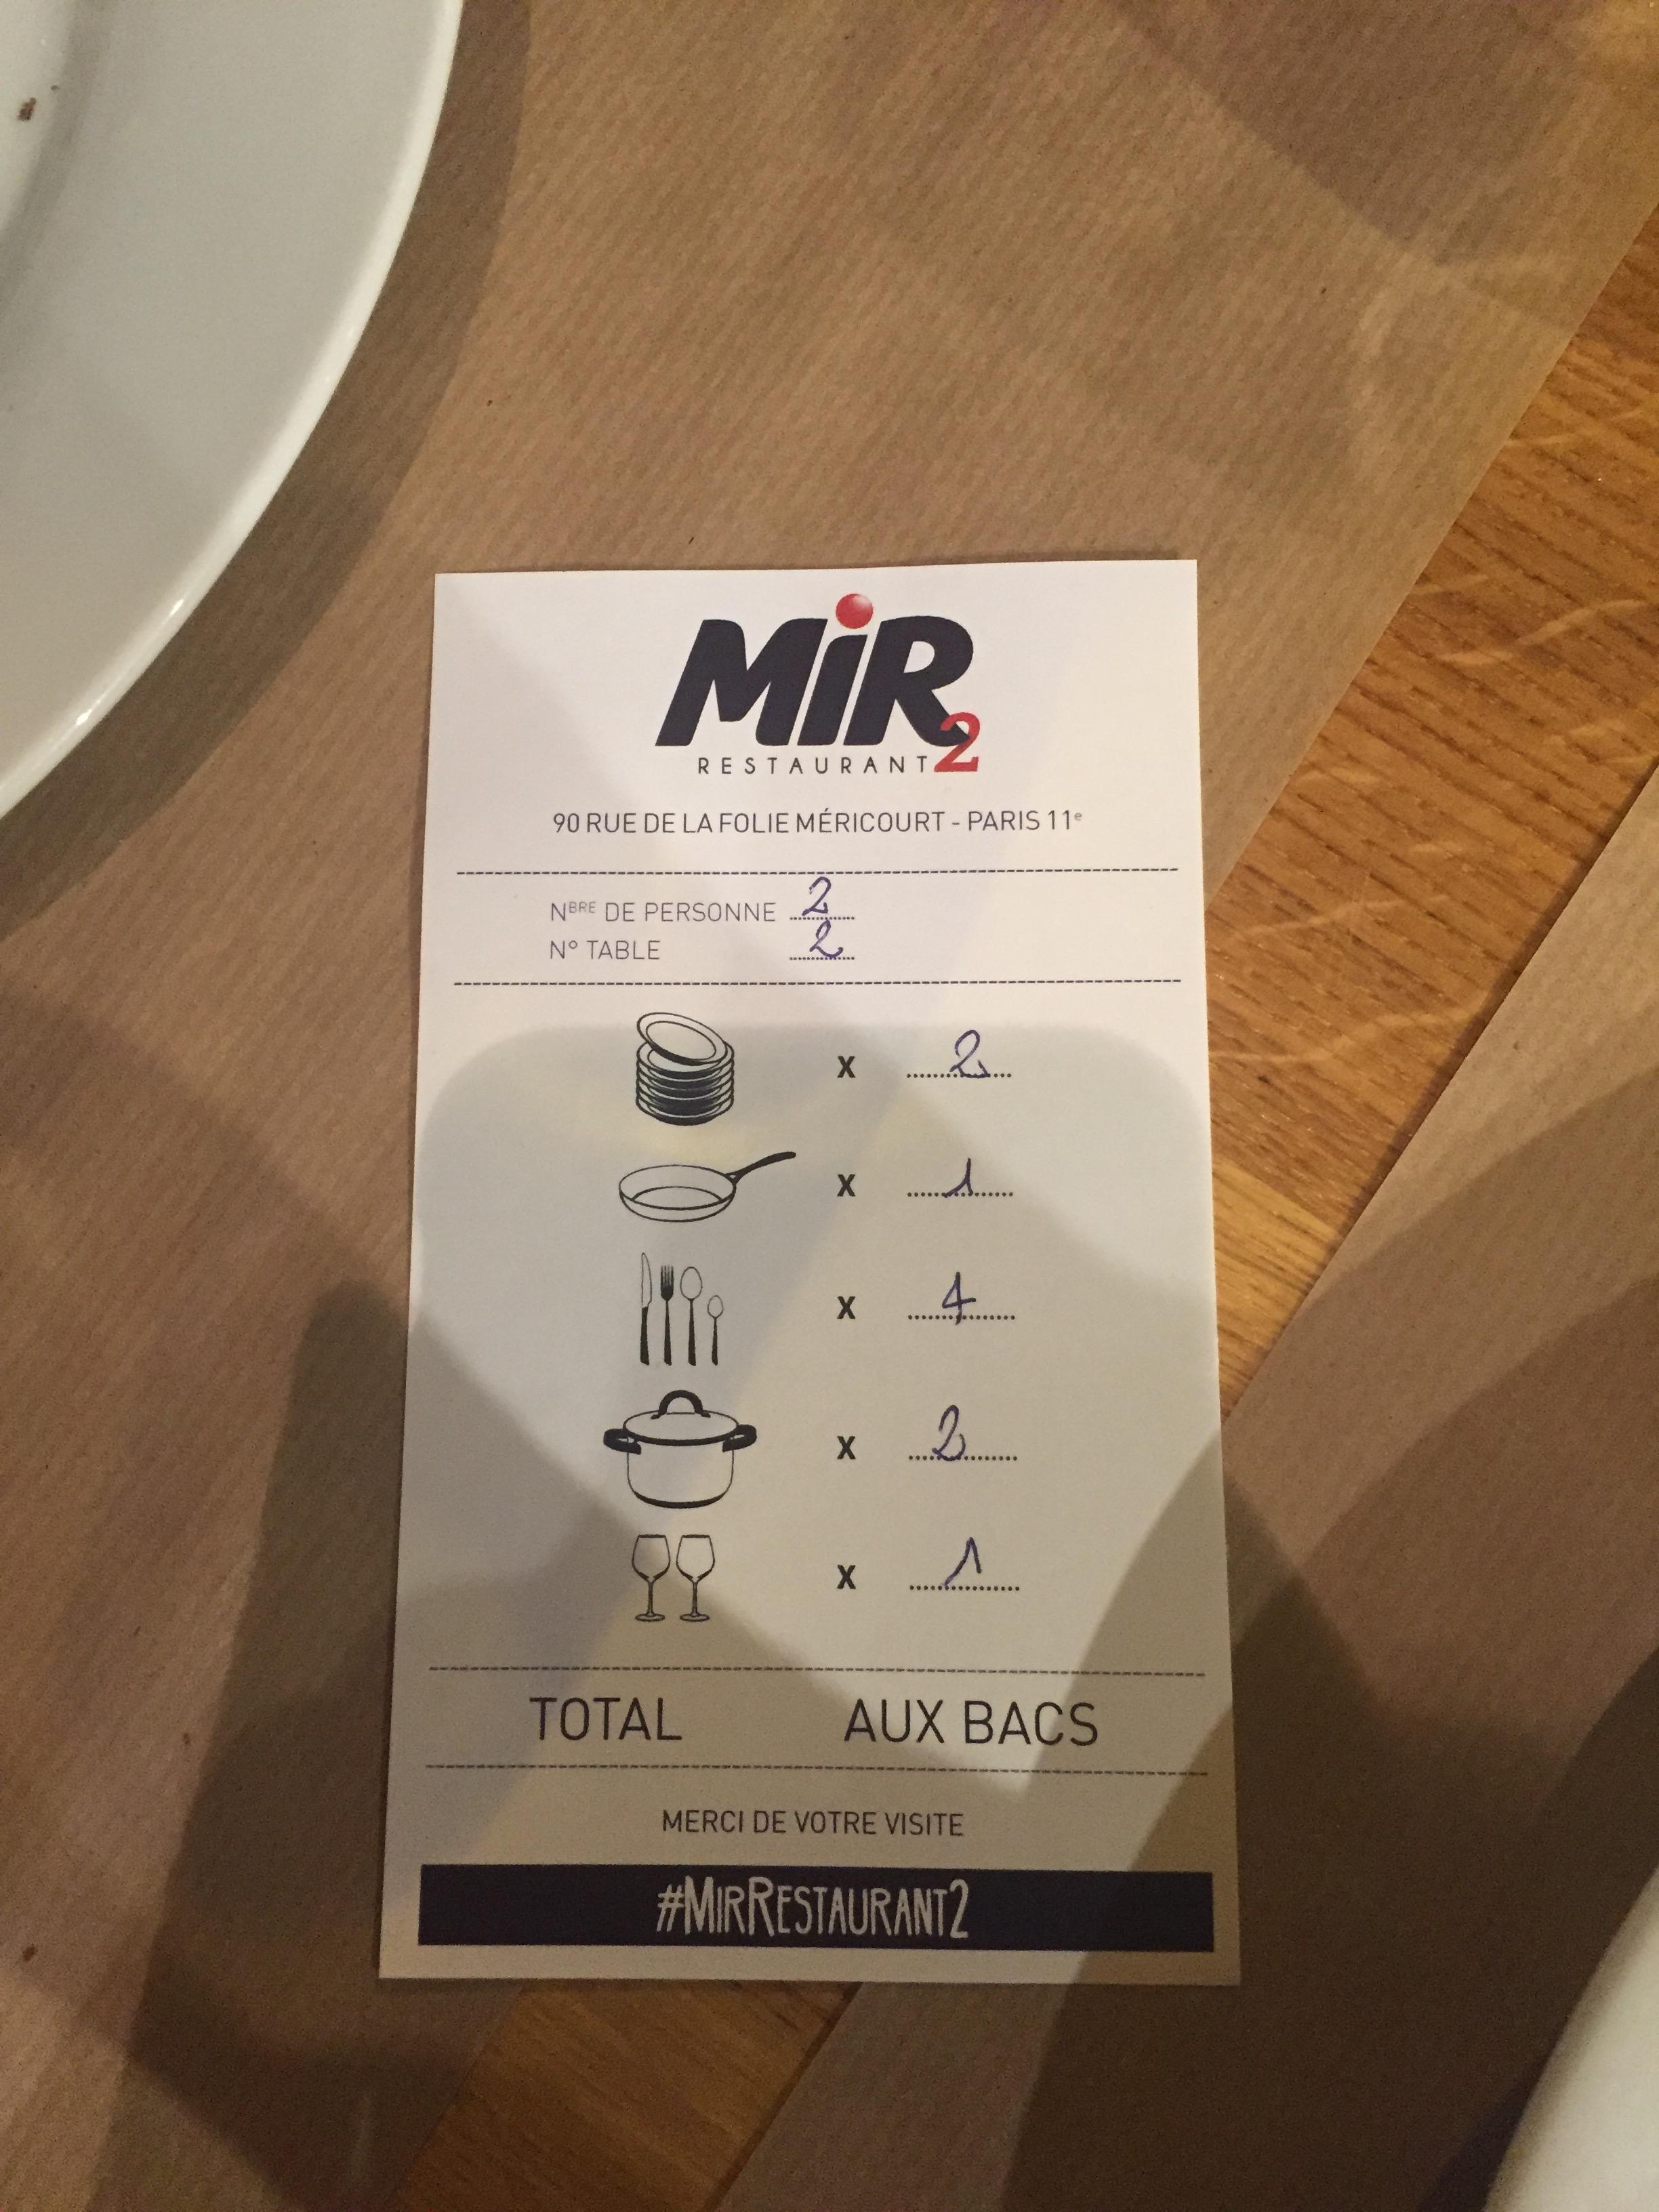 dans-ta-pub-mir-restaurant-vaisselle-liquide-operation-communication-2